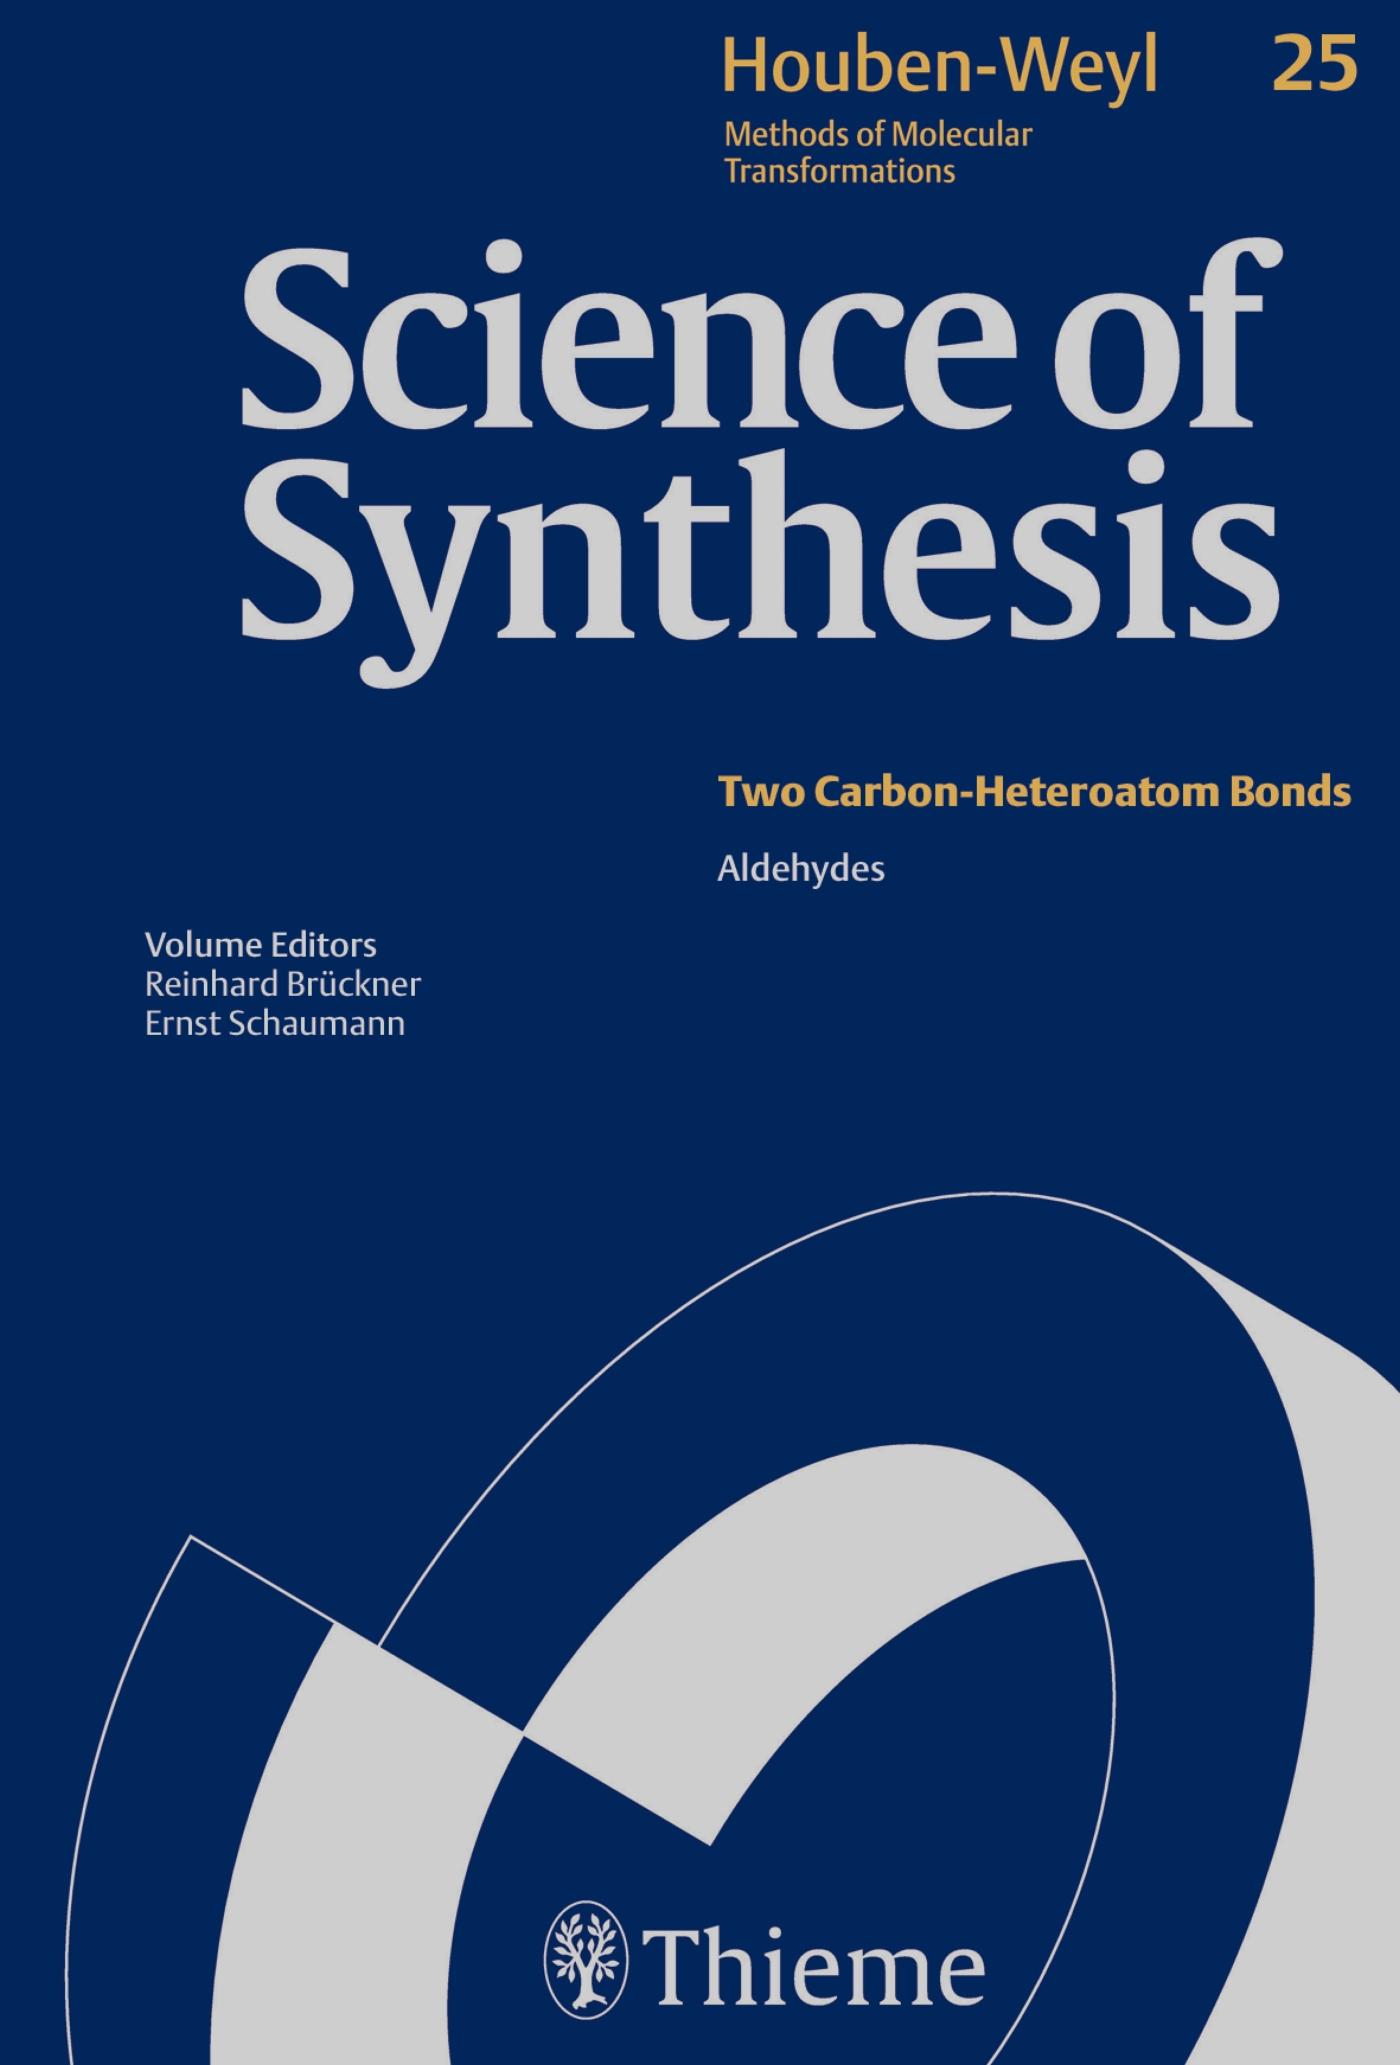 Science of Synthesis: Houben-Weyl Methods of Molecular Transformations  Vol. 25